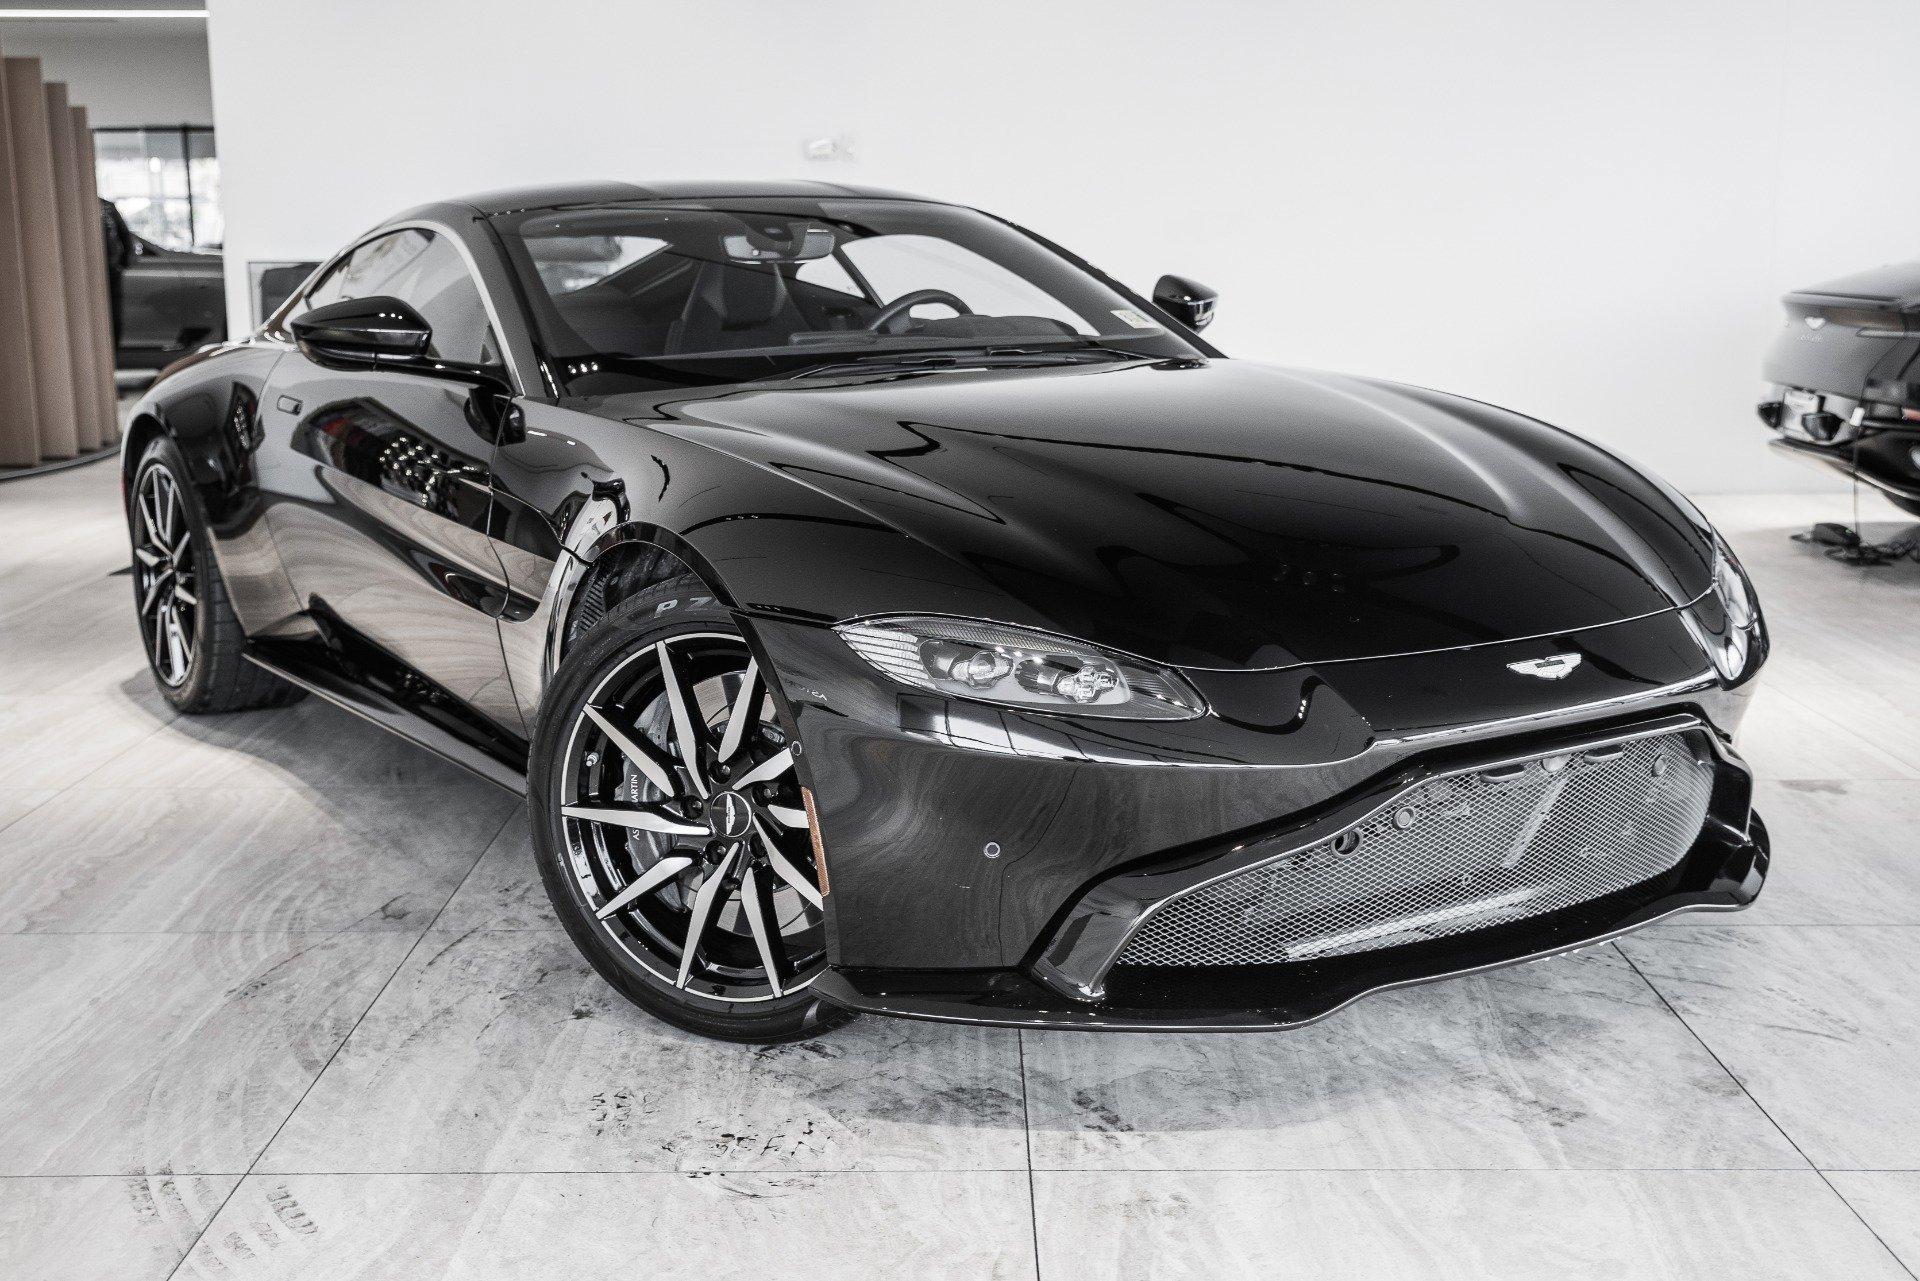 2019 Aston Martin V8 Vantage Coupe image